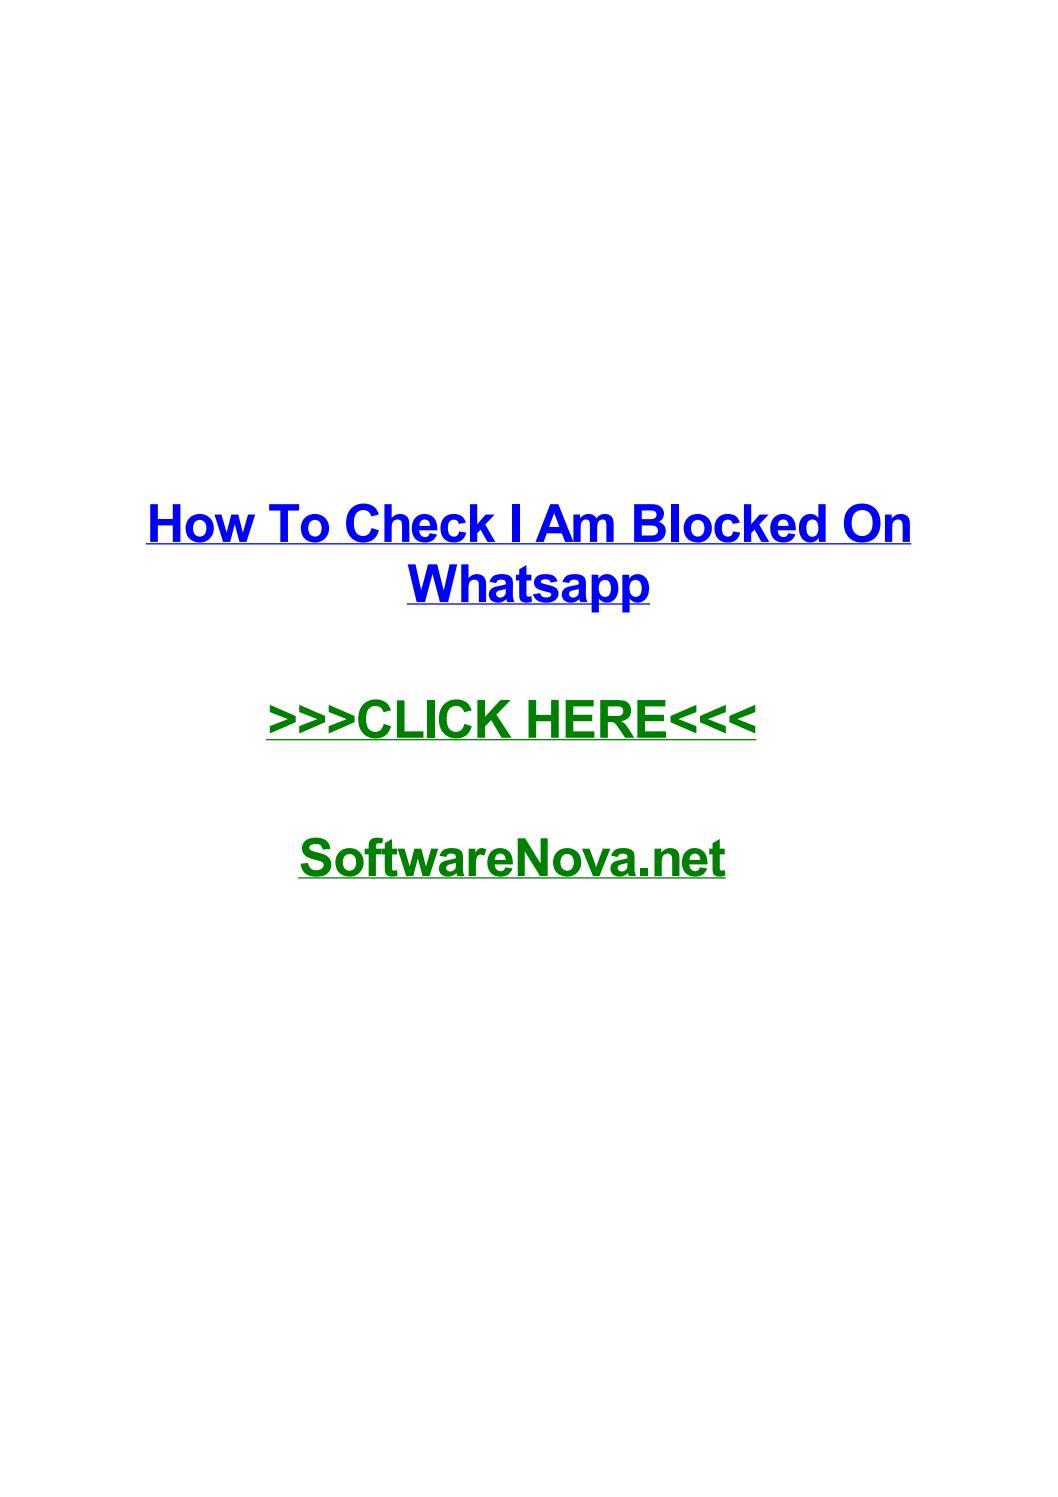 How to check i am blocked on whatsapp by trevermmgsv - issuu